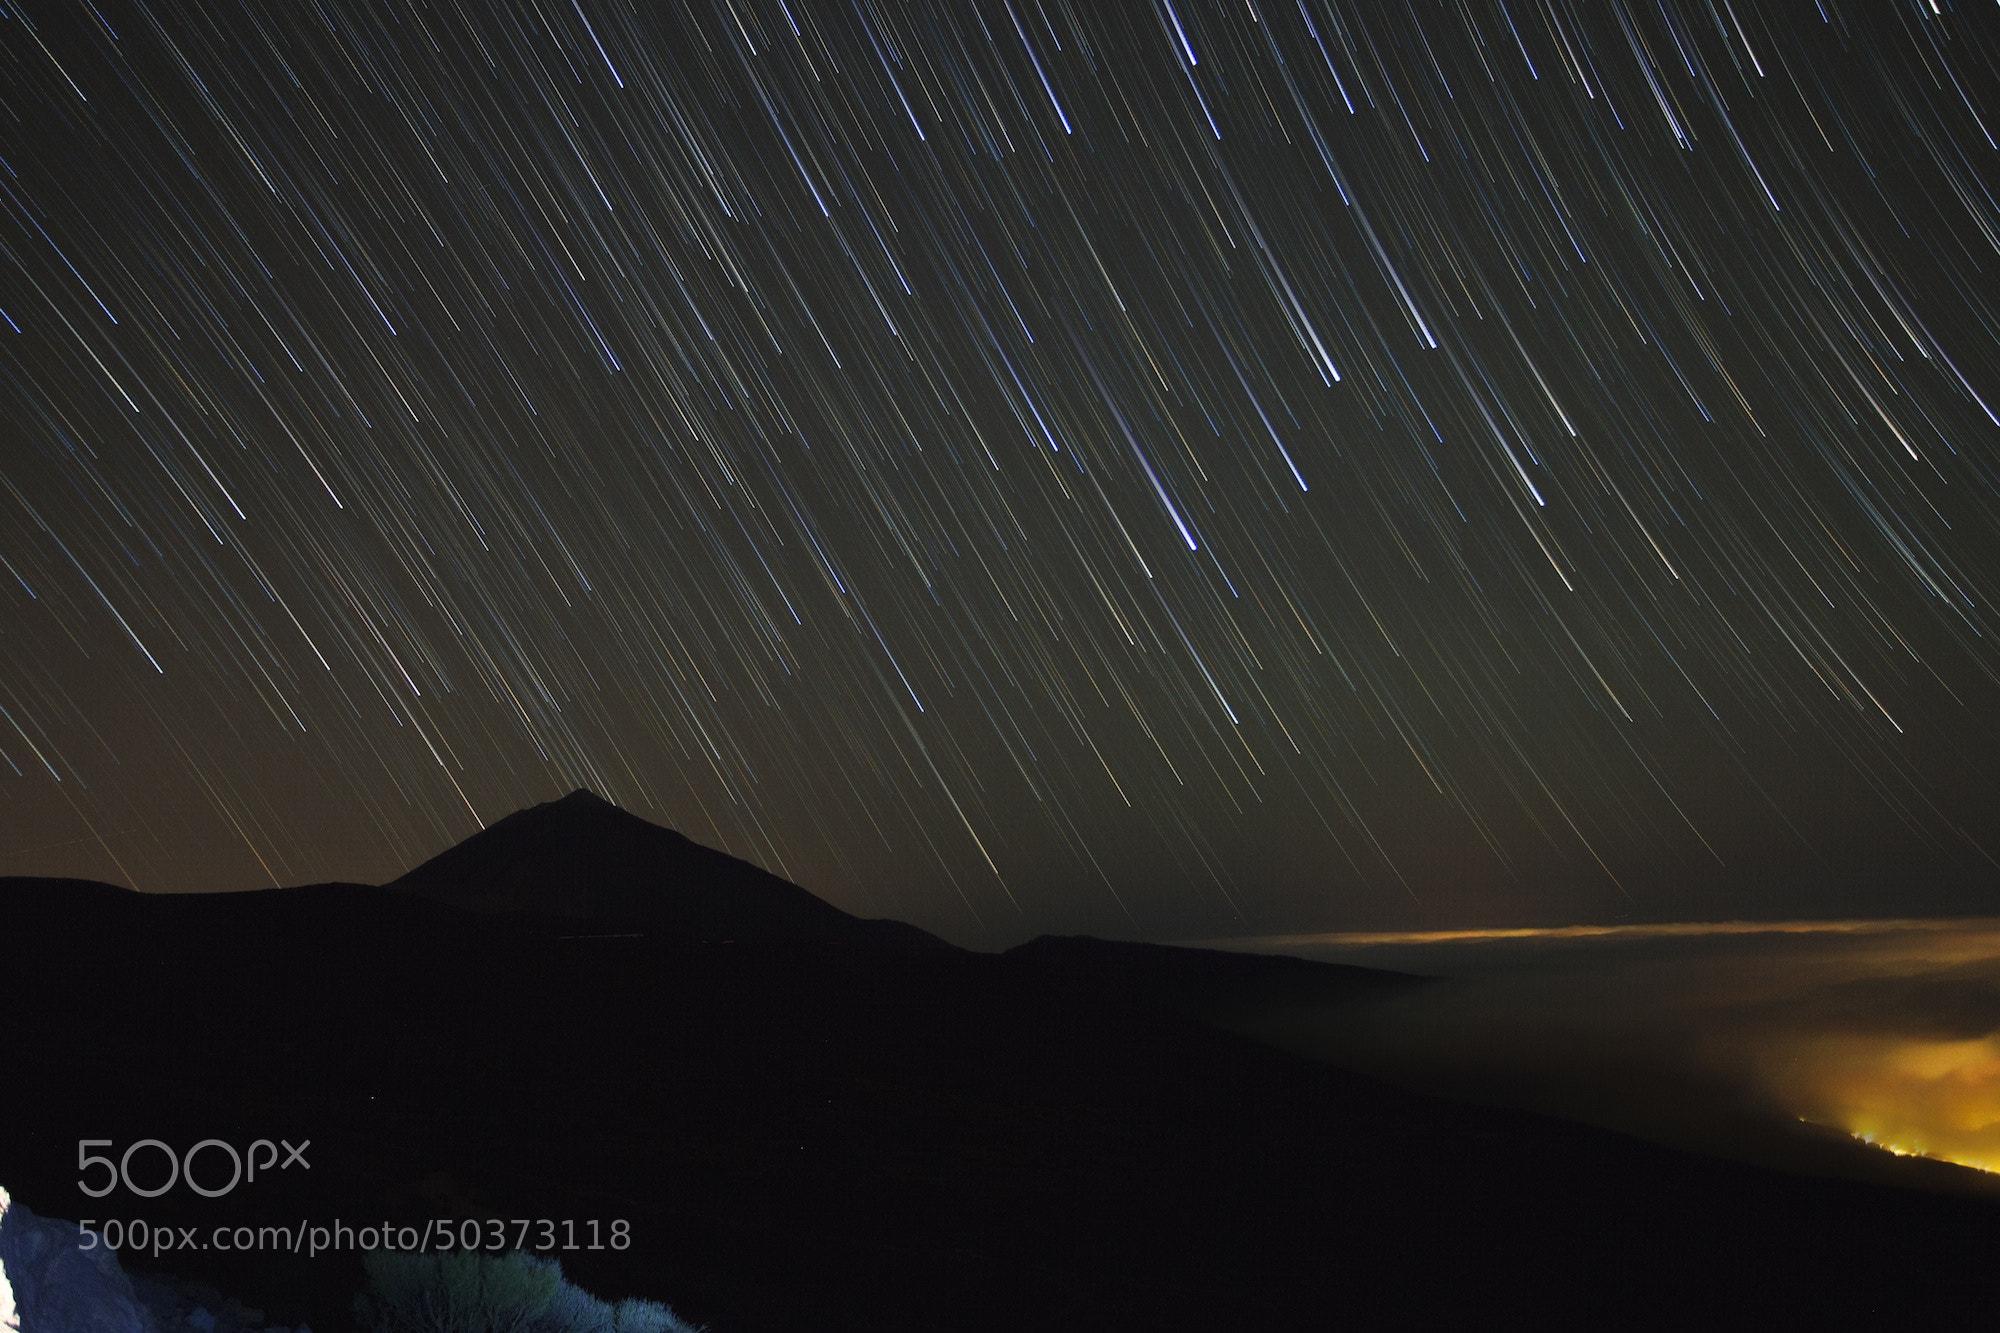 Photograph Startrails over Teide by Tim Nazarov on 500px